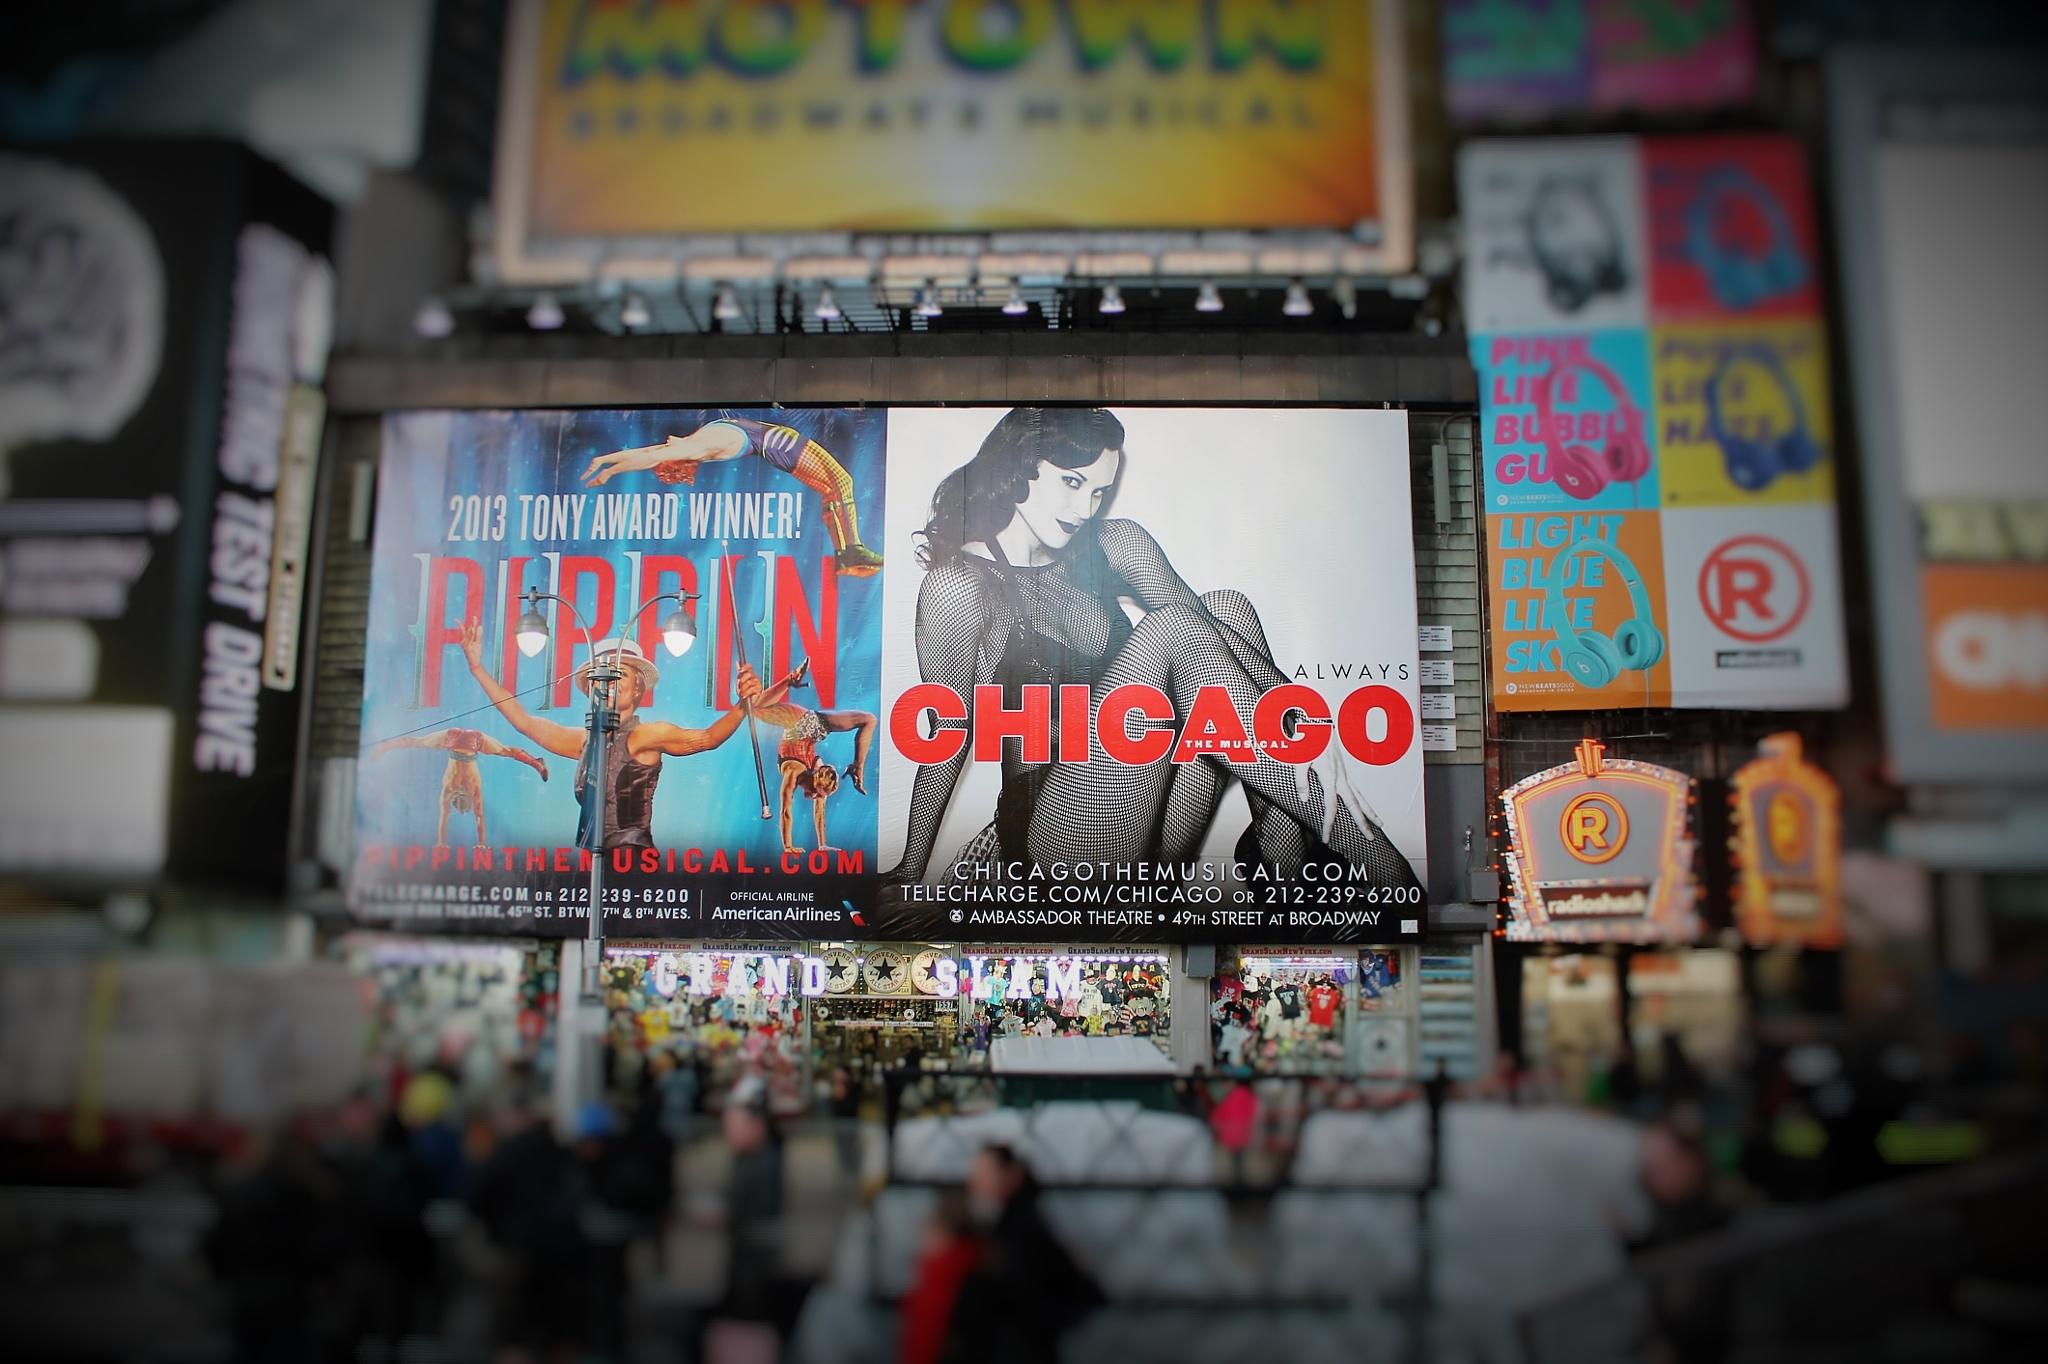 CHICAGO on Broadway,,, by Liborio Drogo